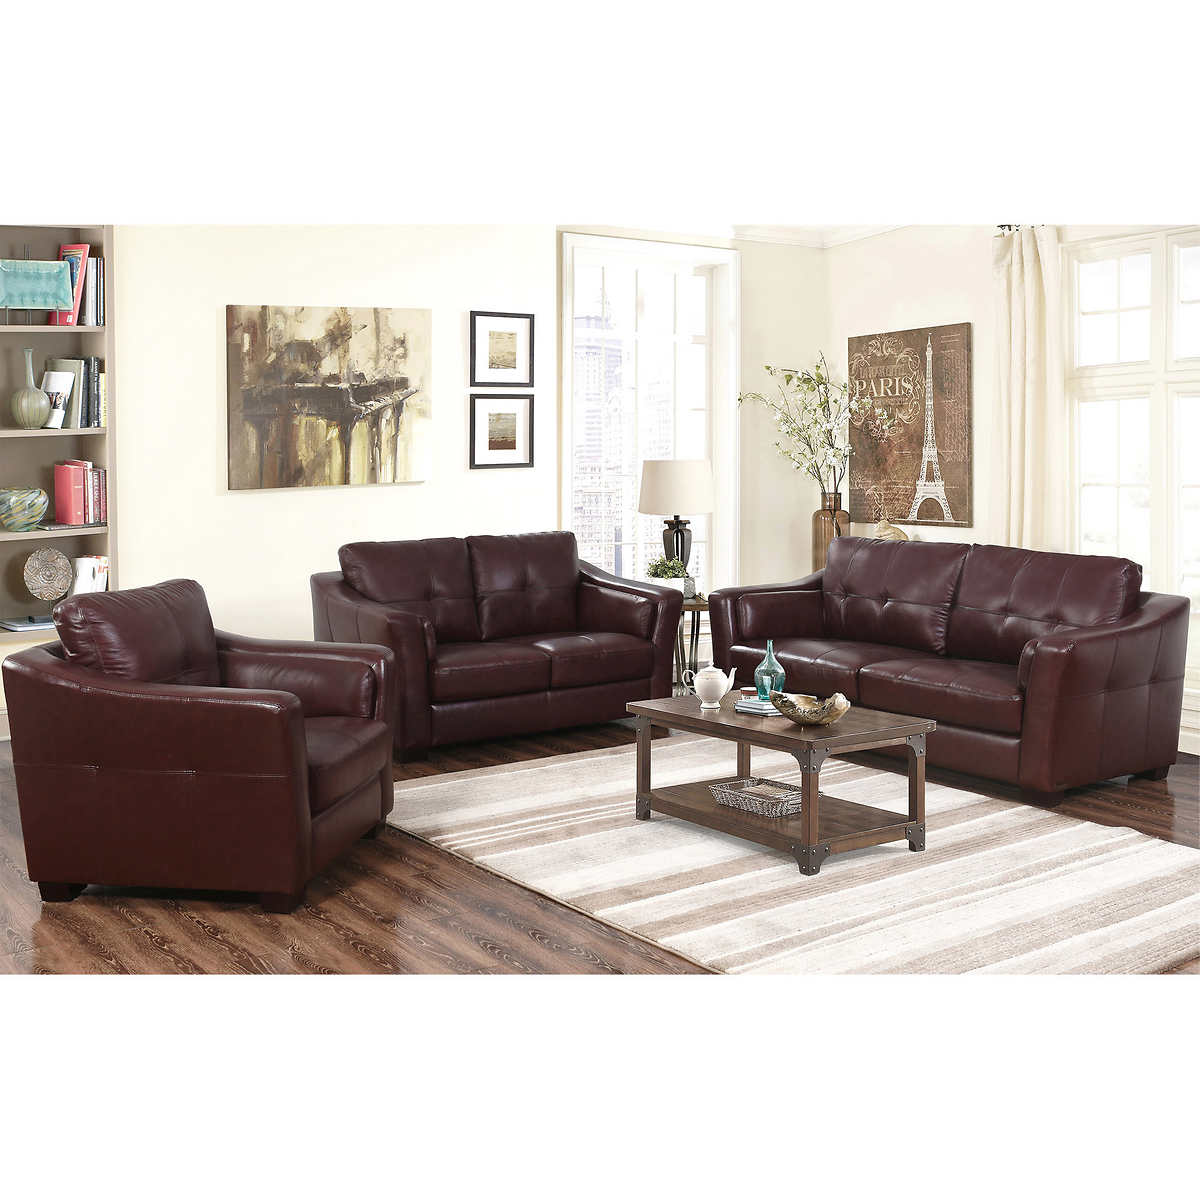 Florentine 3-piece Top Grain Leather Living Room Set